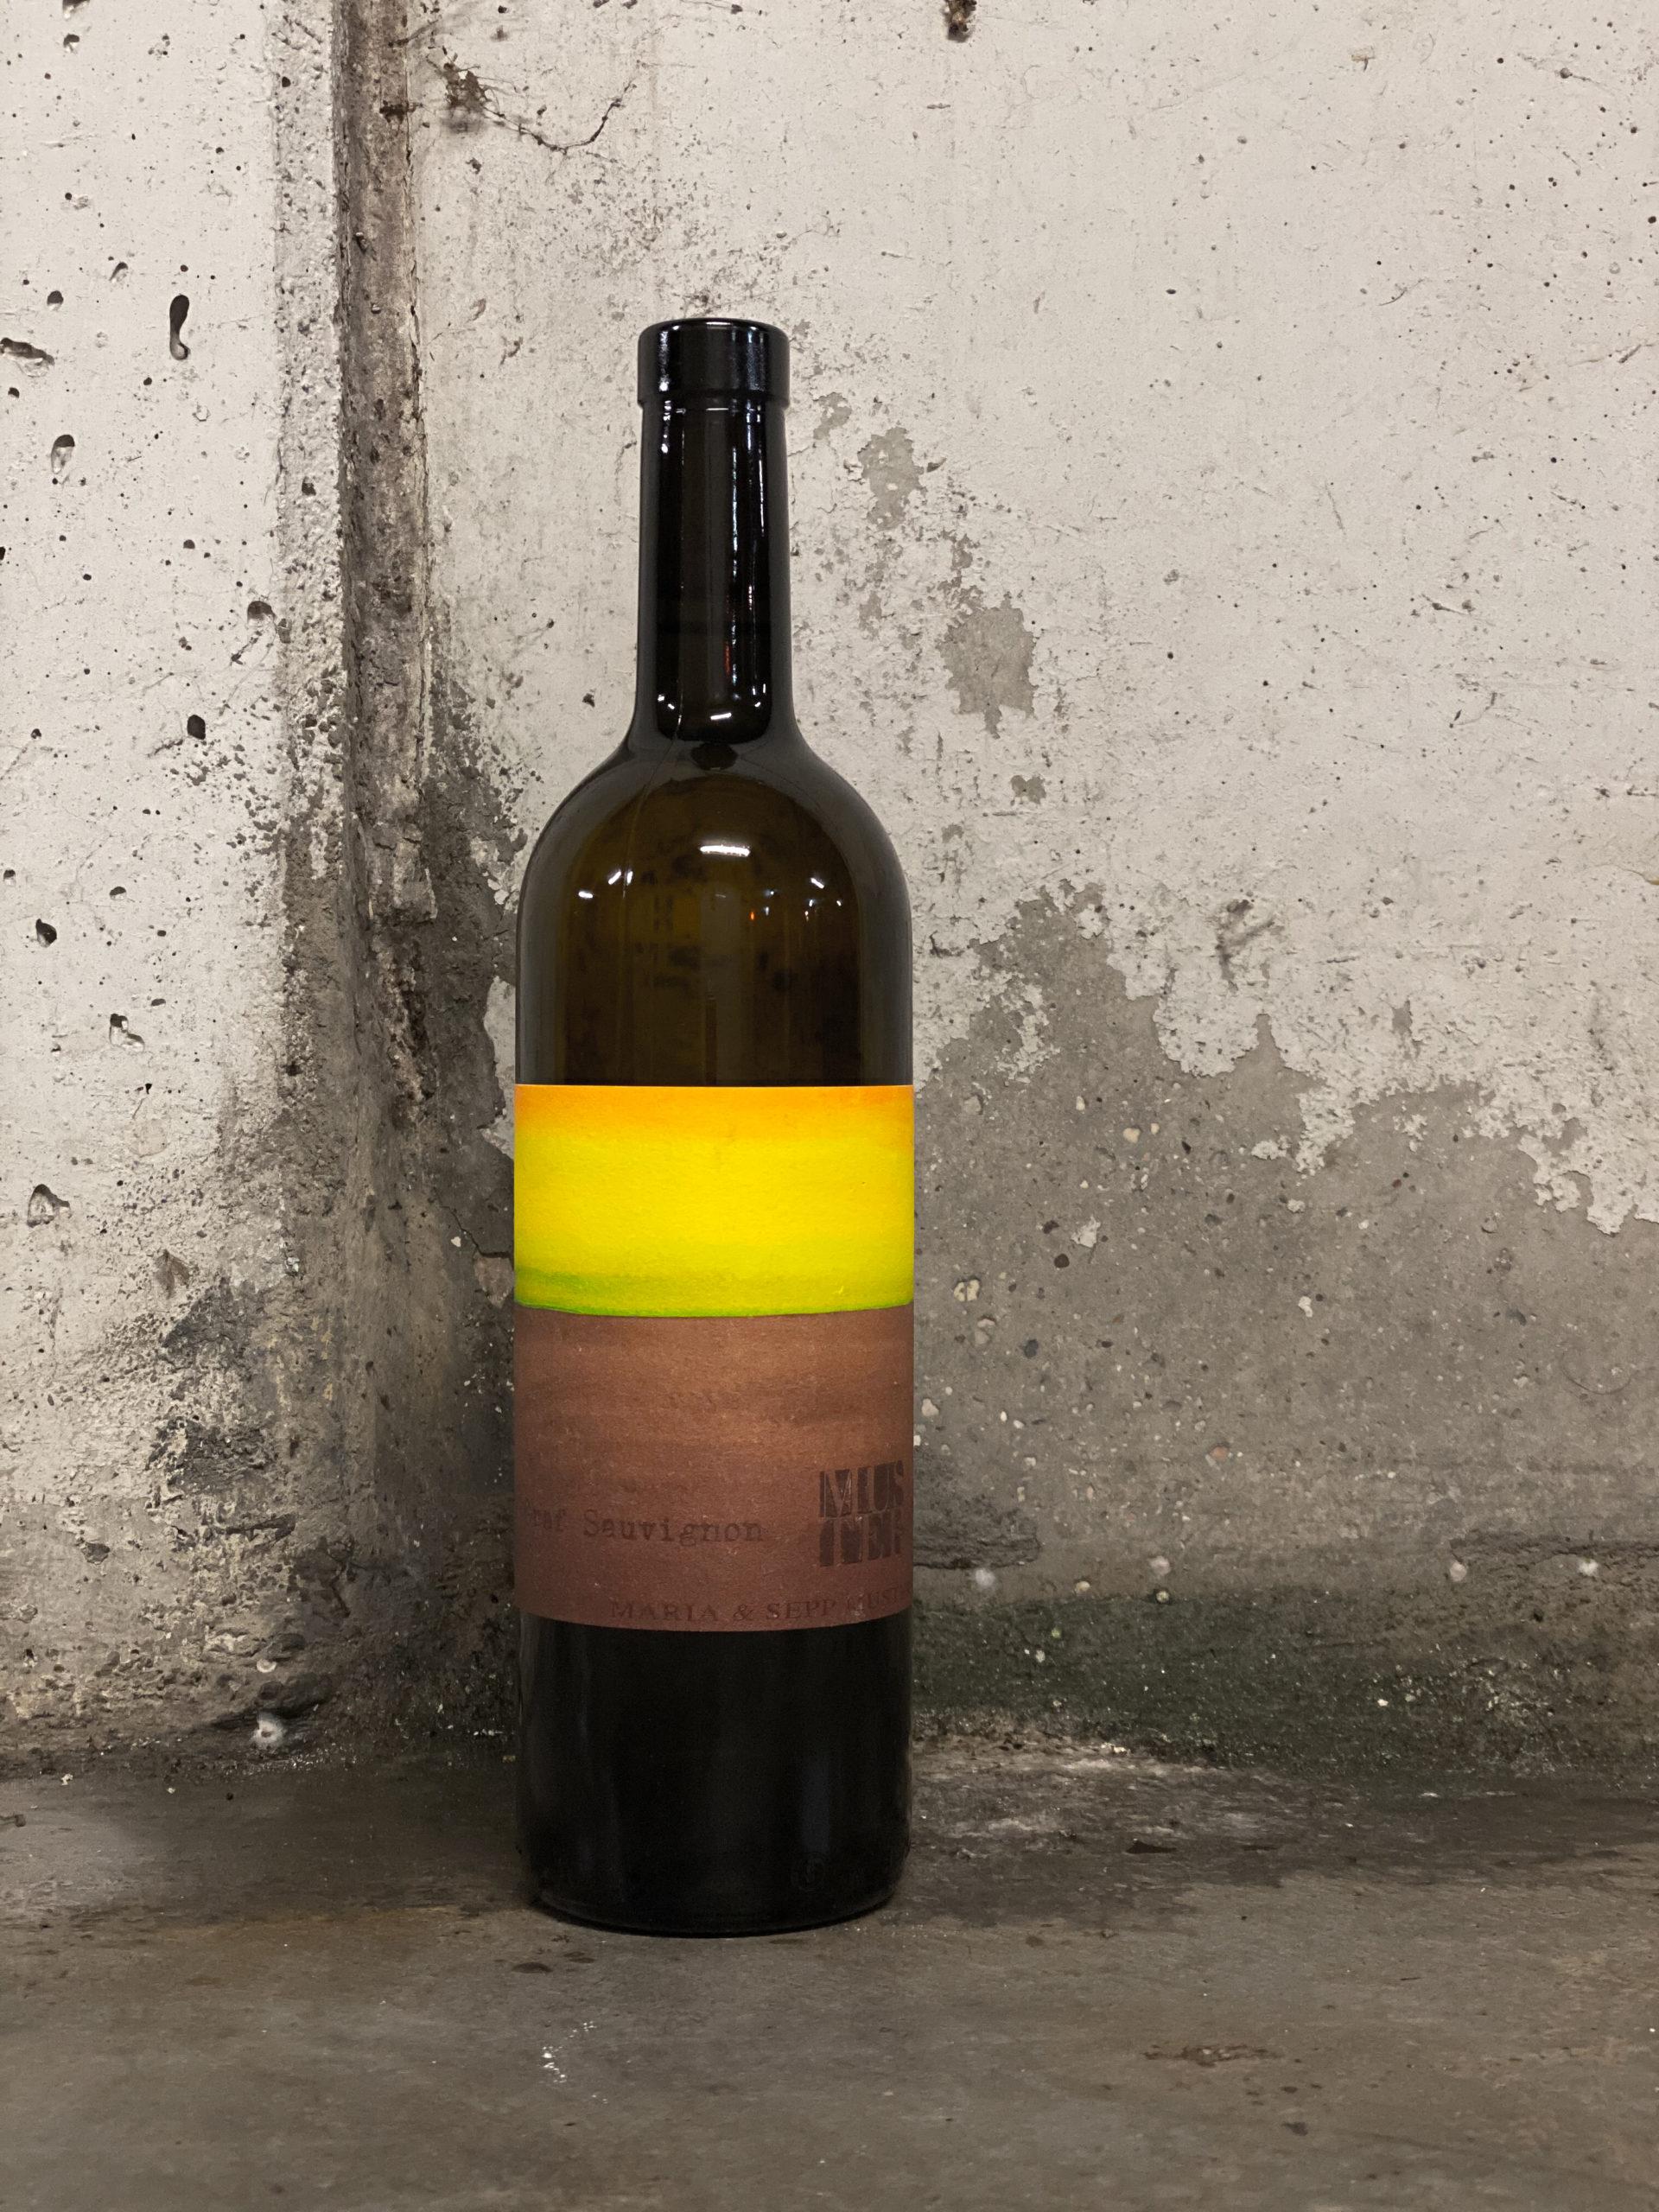 Weingut Muster Graf Sauvignon